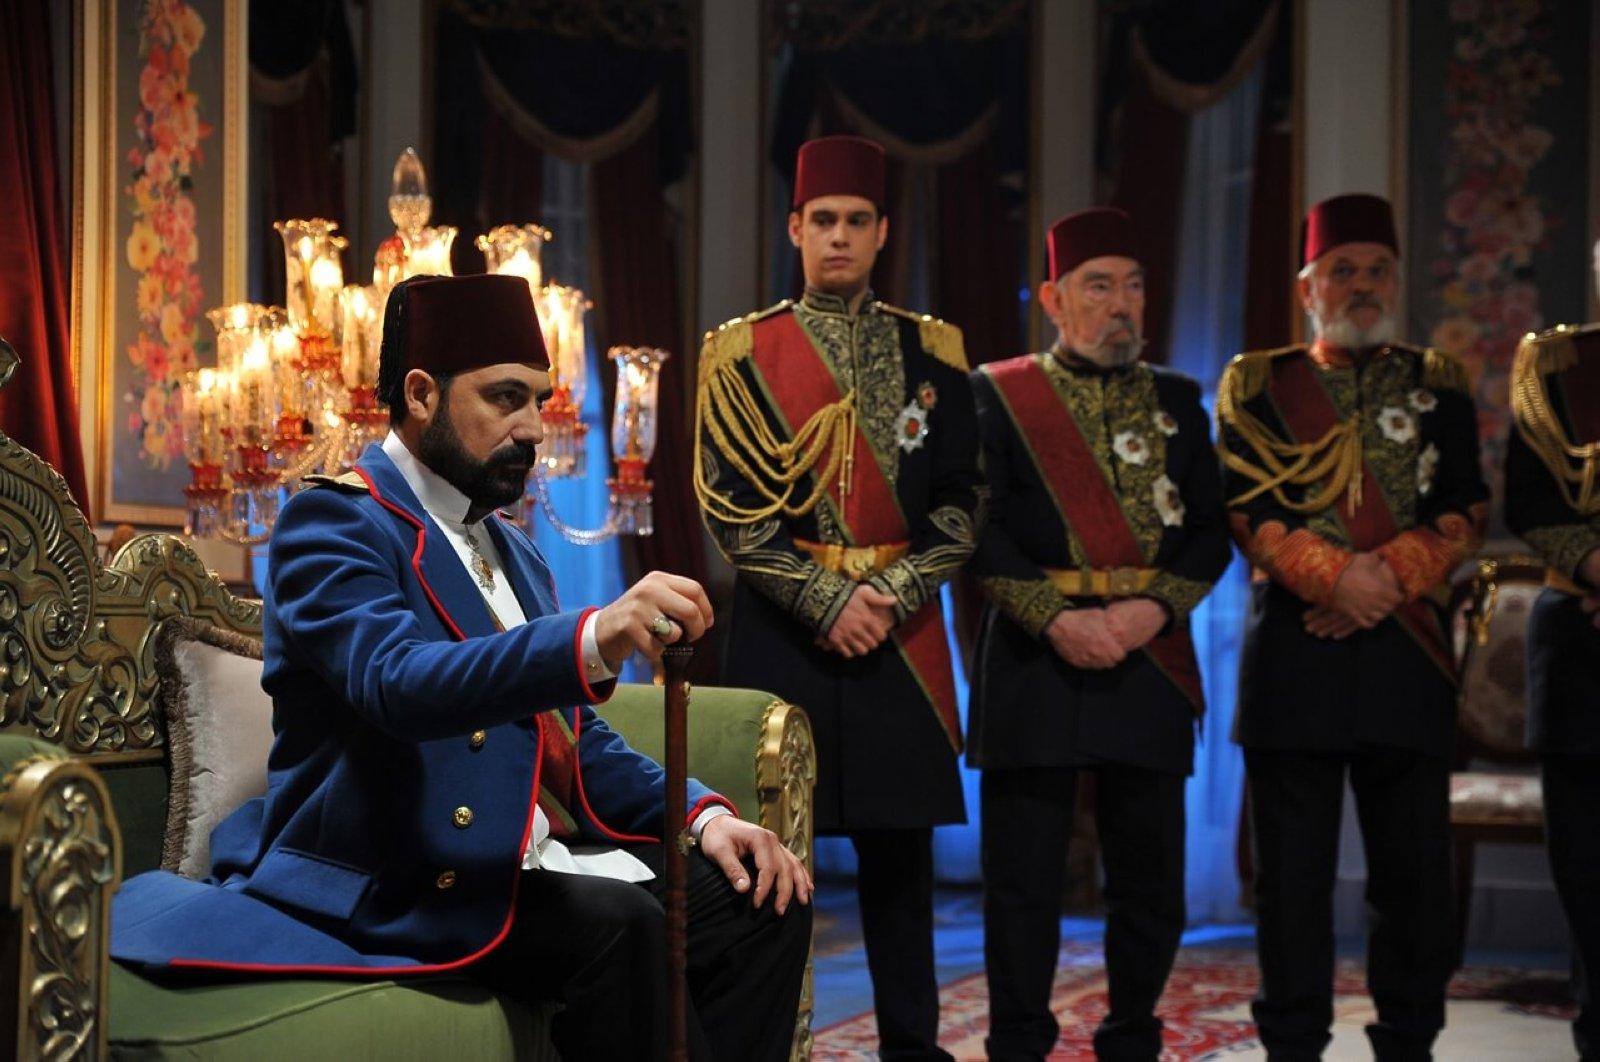 Indonesians prefer Turkish films to kill boredom | Daily Sabah